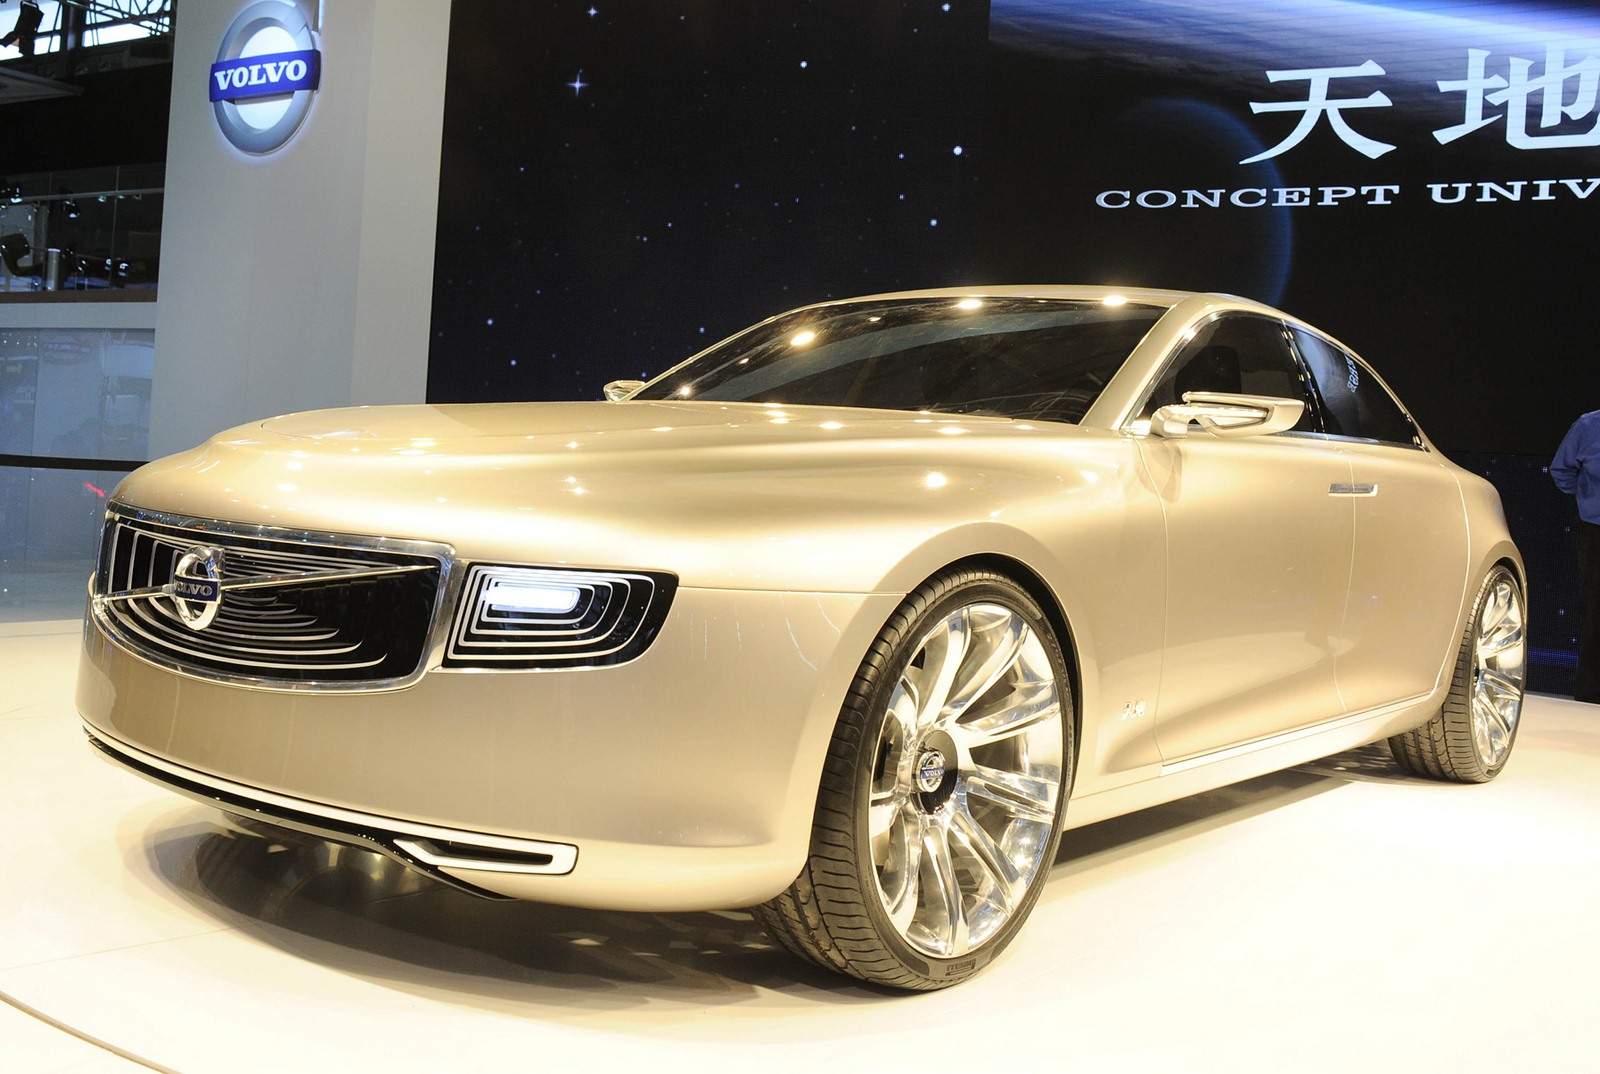 Shangai Auto Show 2011